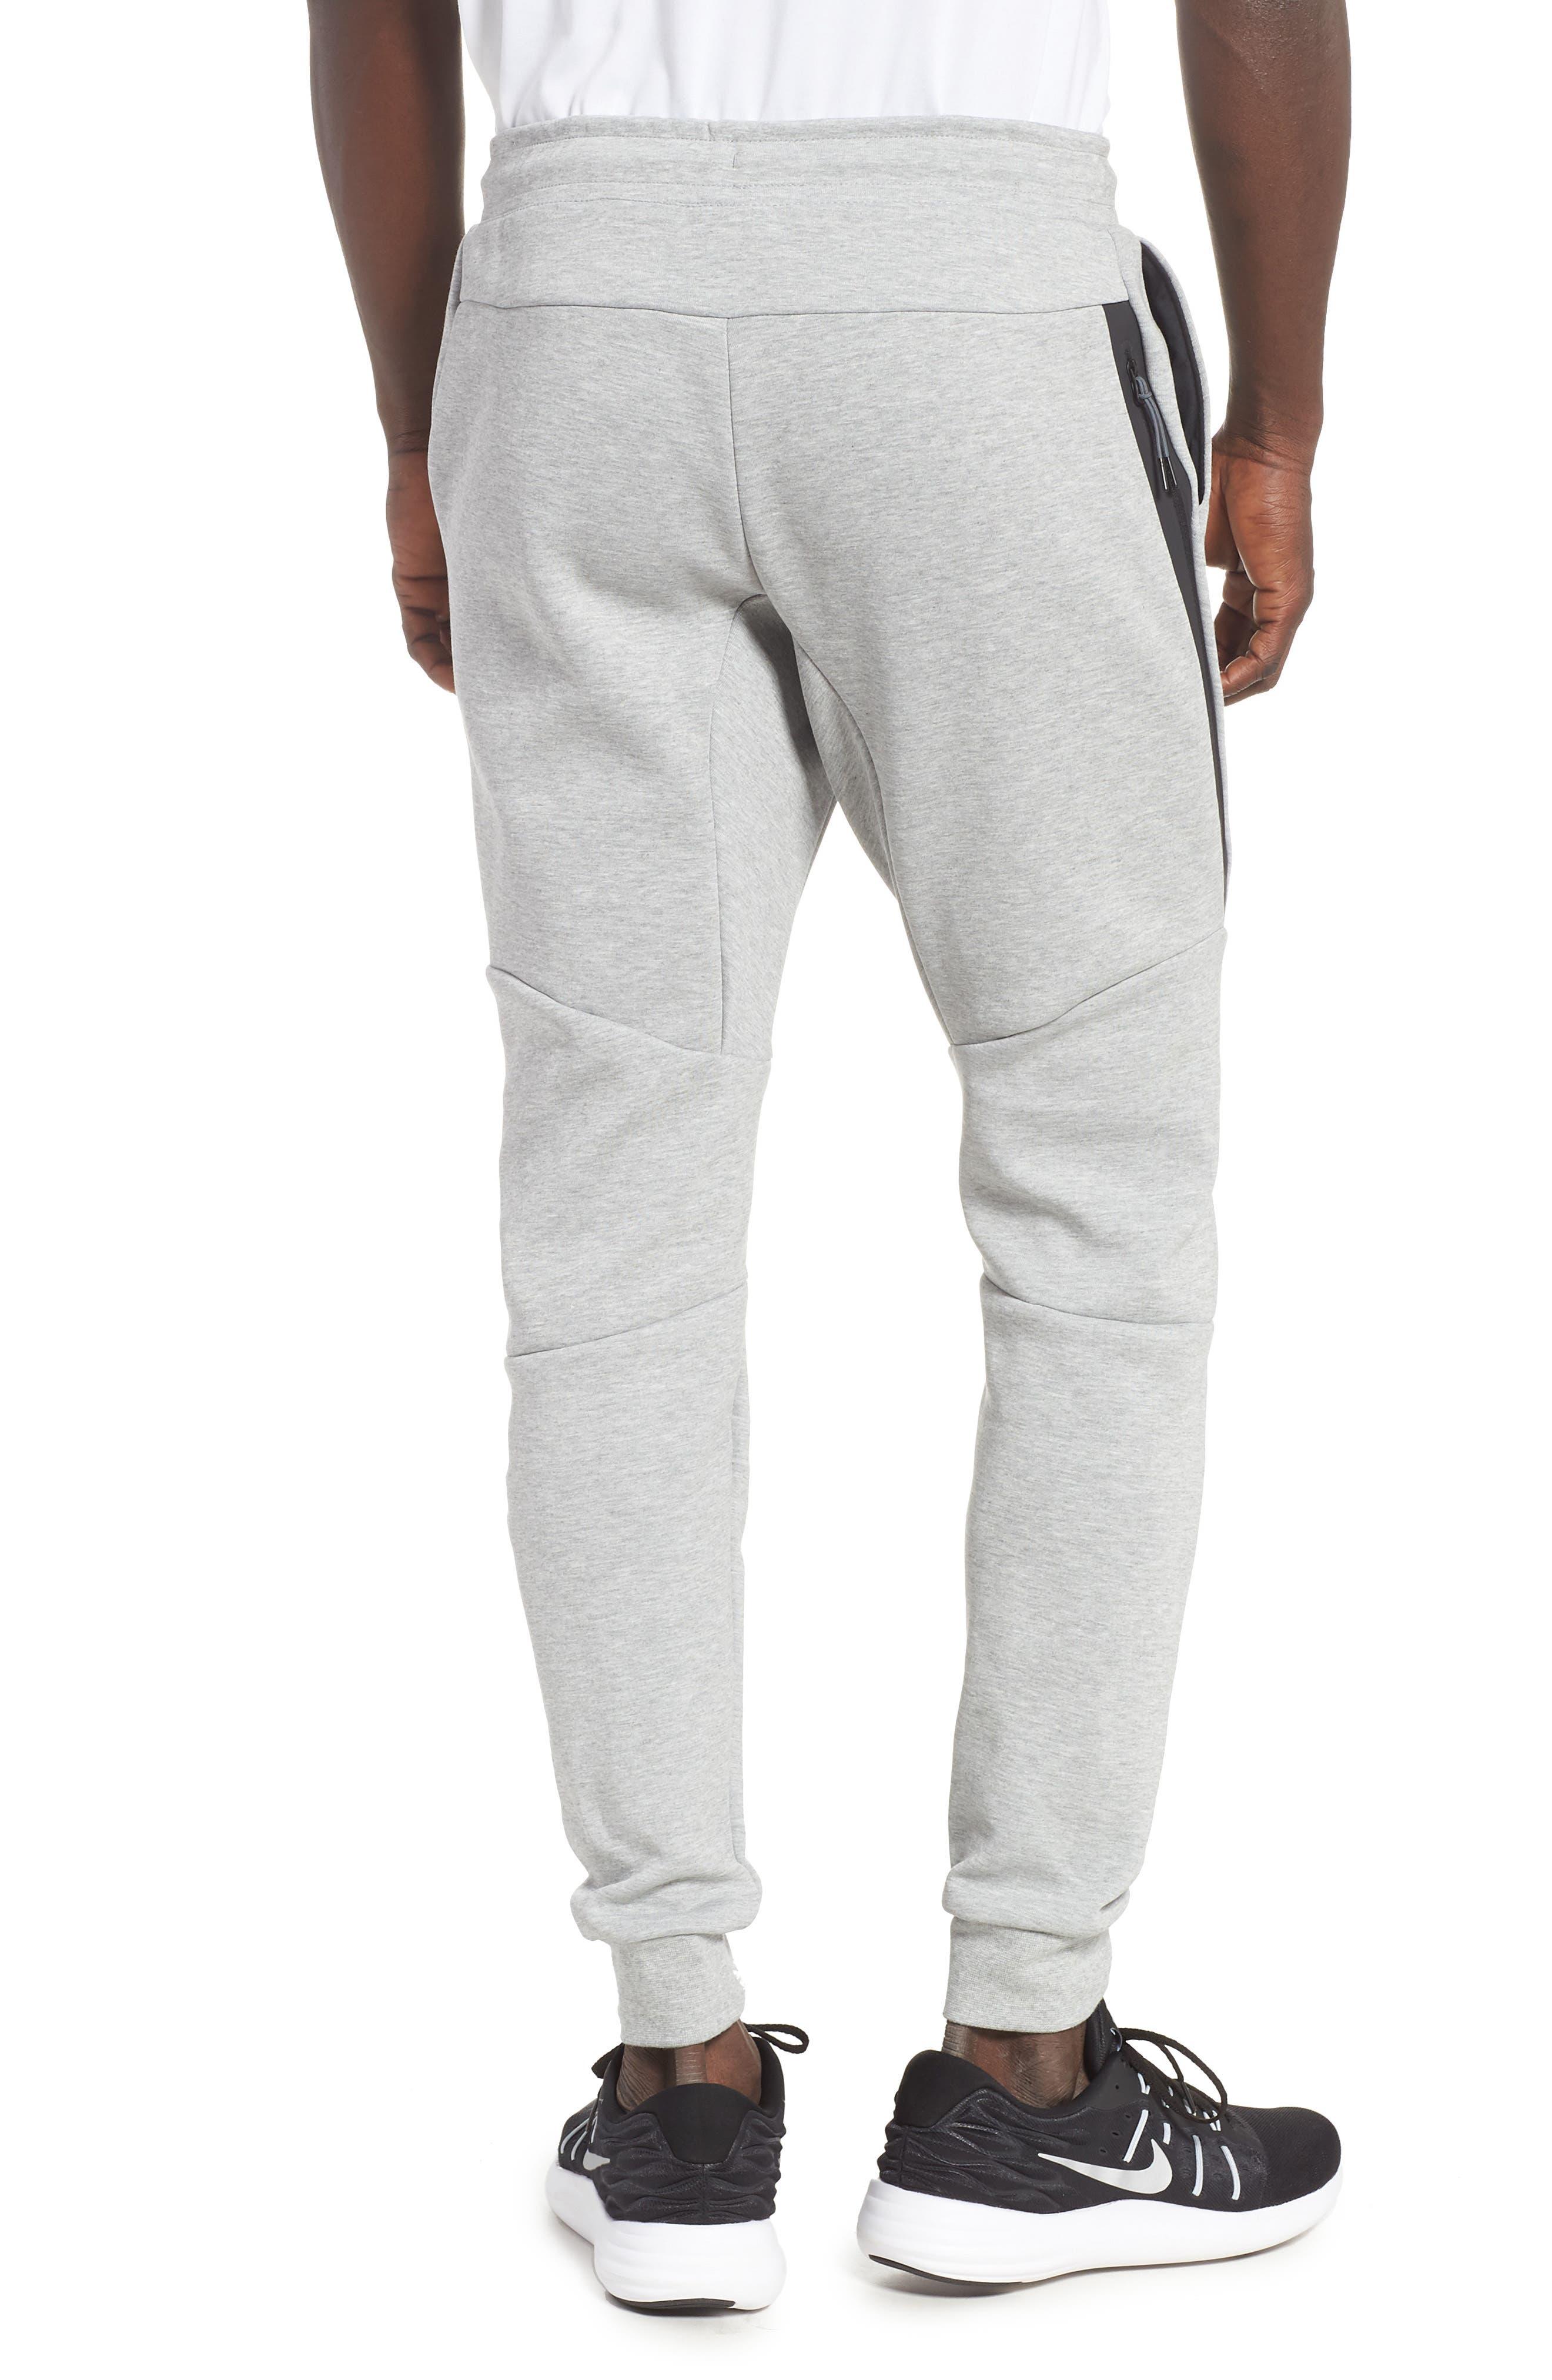 04f6c182ac9 Men's Nike Clothing | Nordstrom